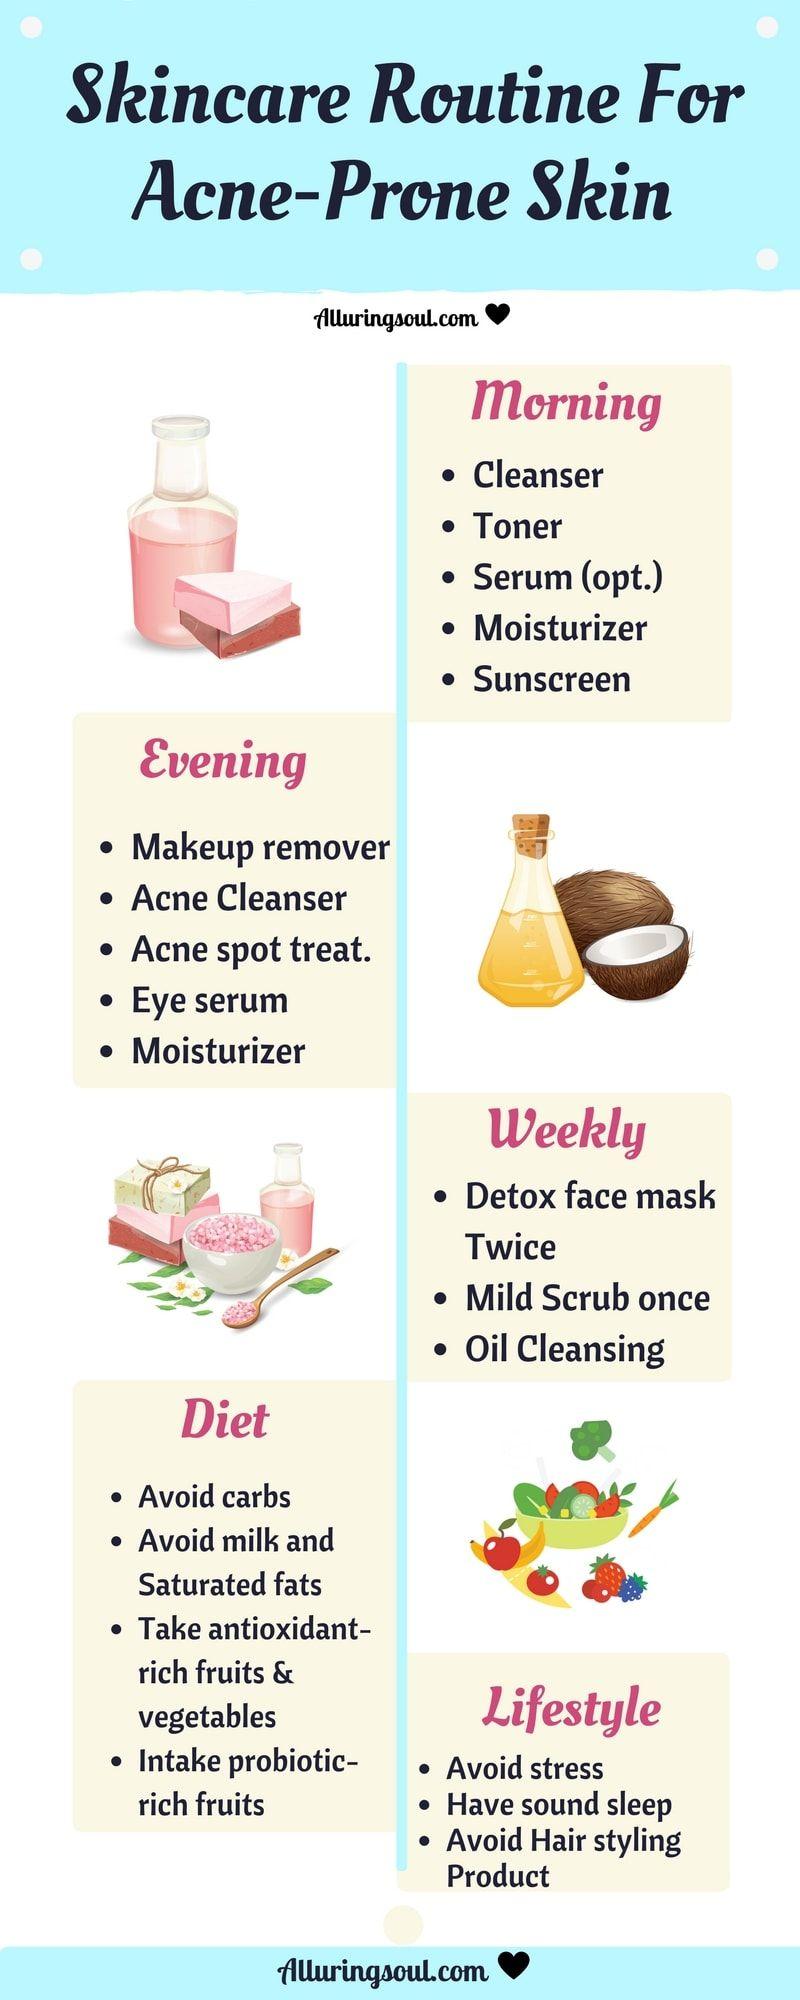 Natural Skin Care Guide For Acne Prone Skin Skin Care Guide Acne Prone Skin Skin Care Regimen